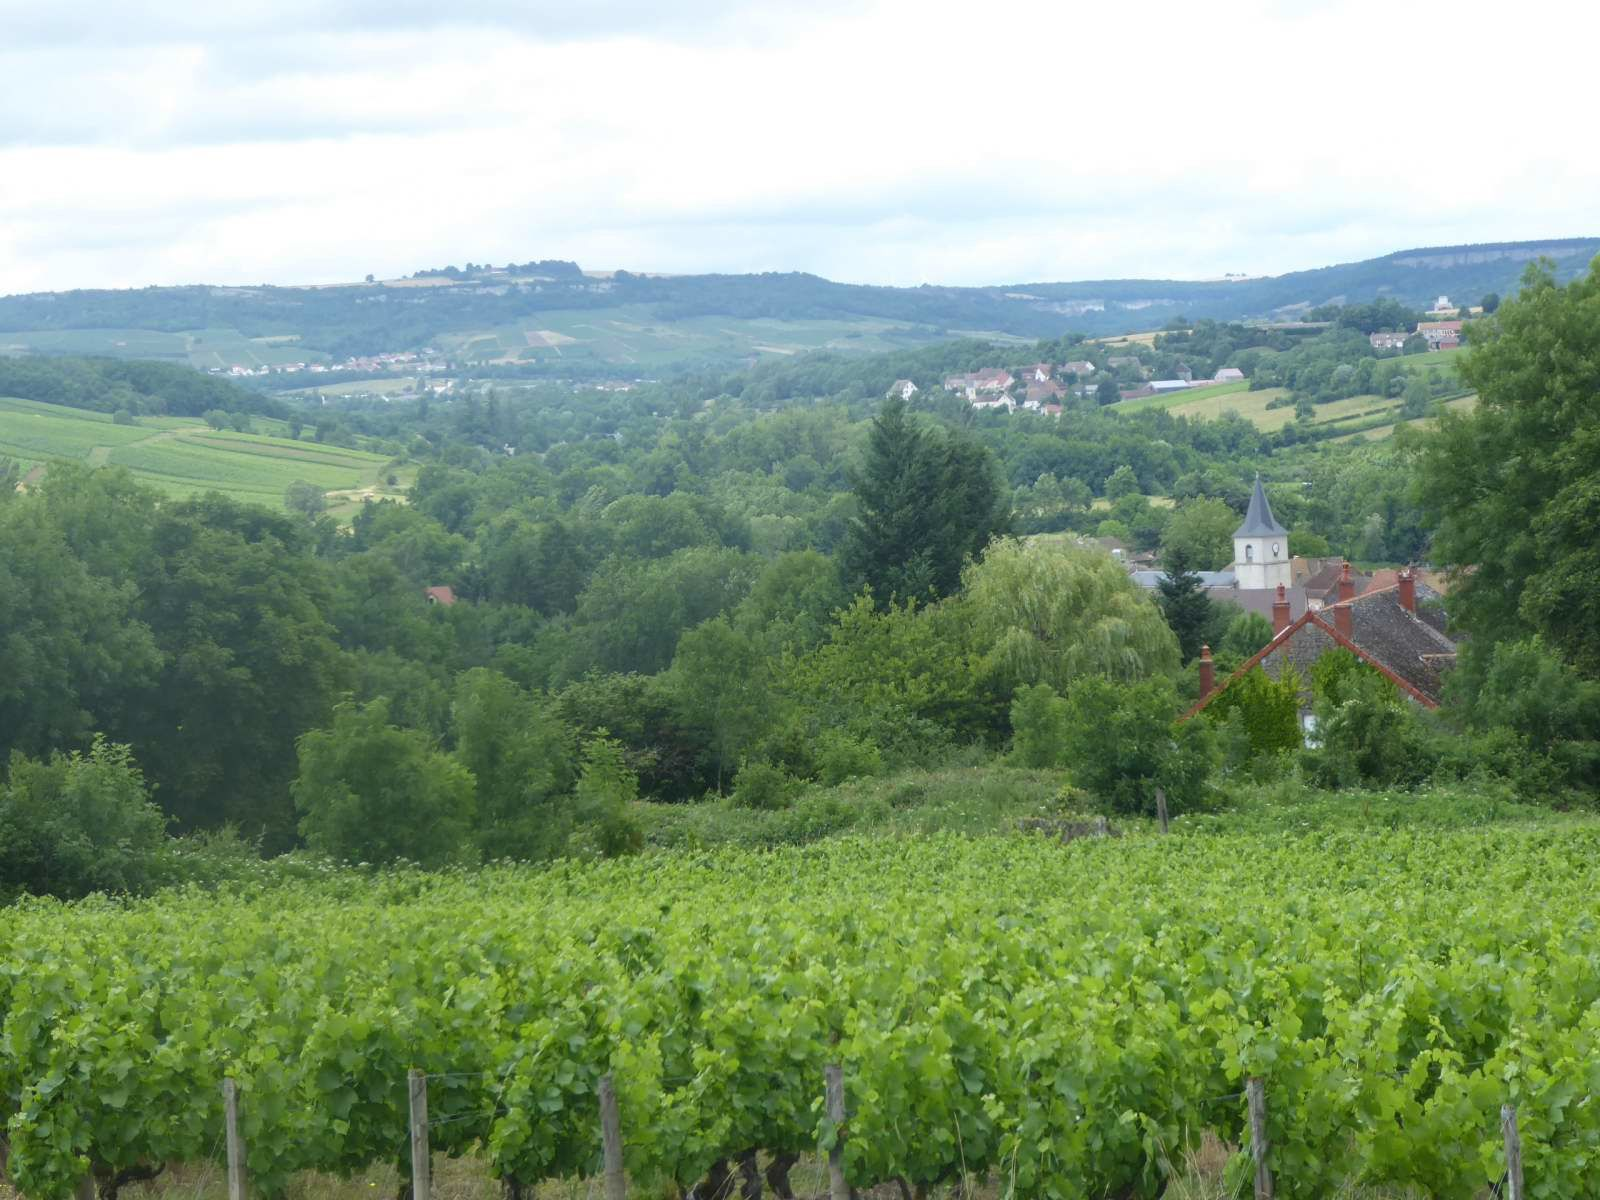 La vallée de la Cozanne (29/6/2017)